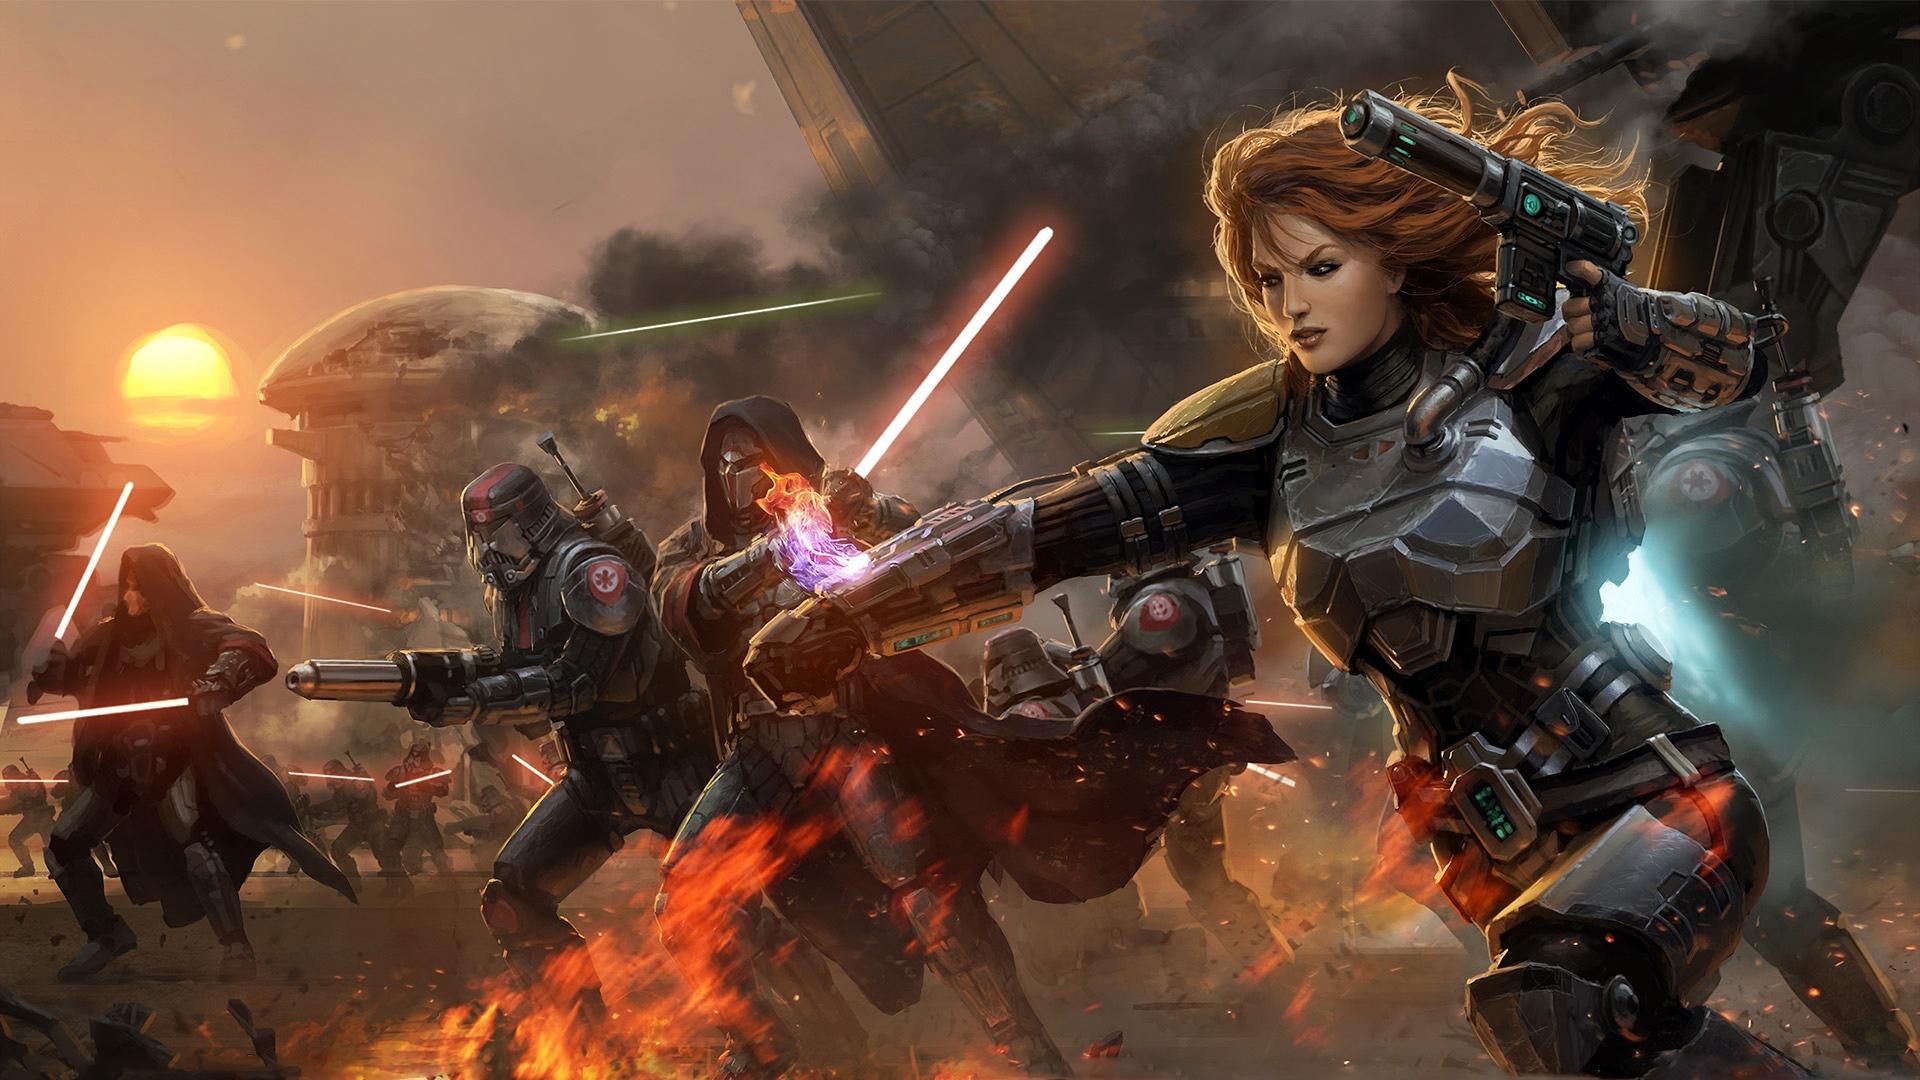 Анонсирован патч для Star Wars: The Old Republic